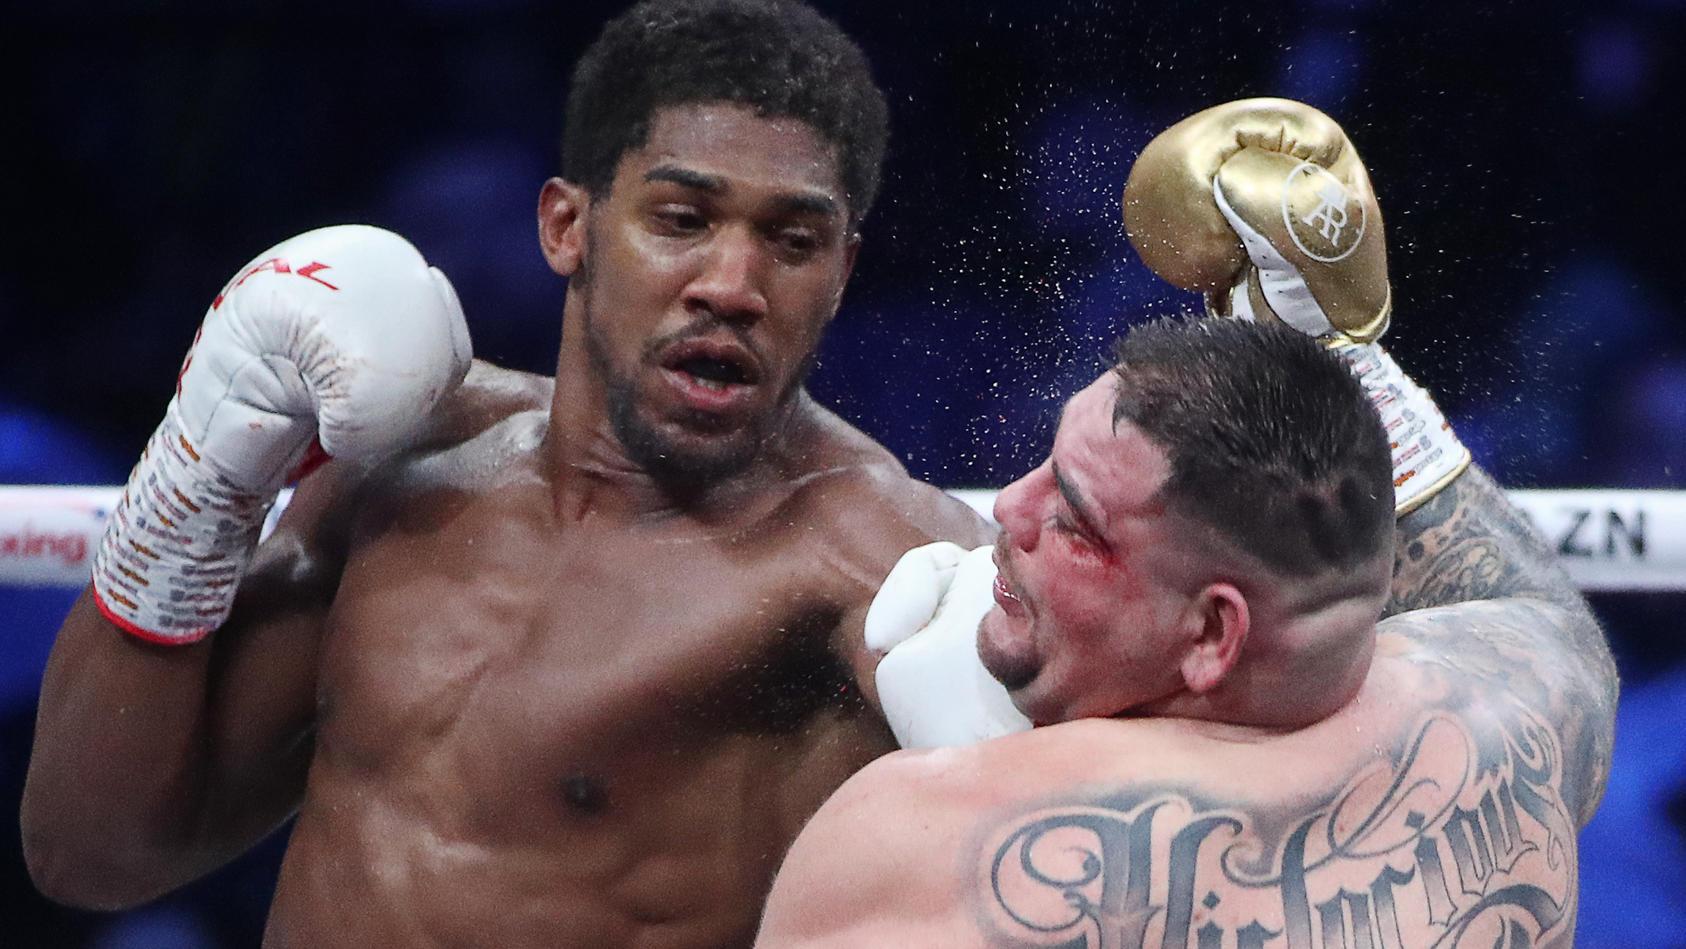 SAUDI ARABIA - DECEMBER 8, 2019: British boxer Anthony Joshua (L) and his American rival Andy Ruiz Jr struggle in their